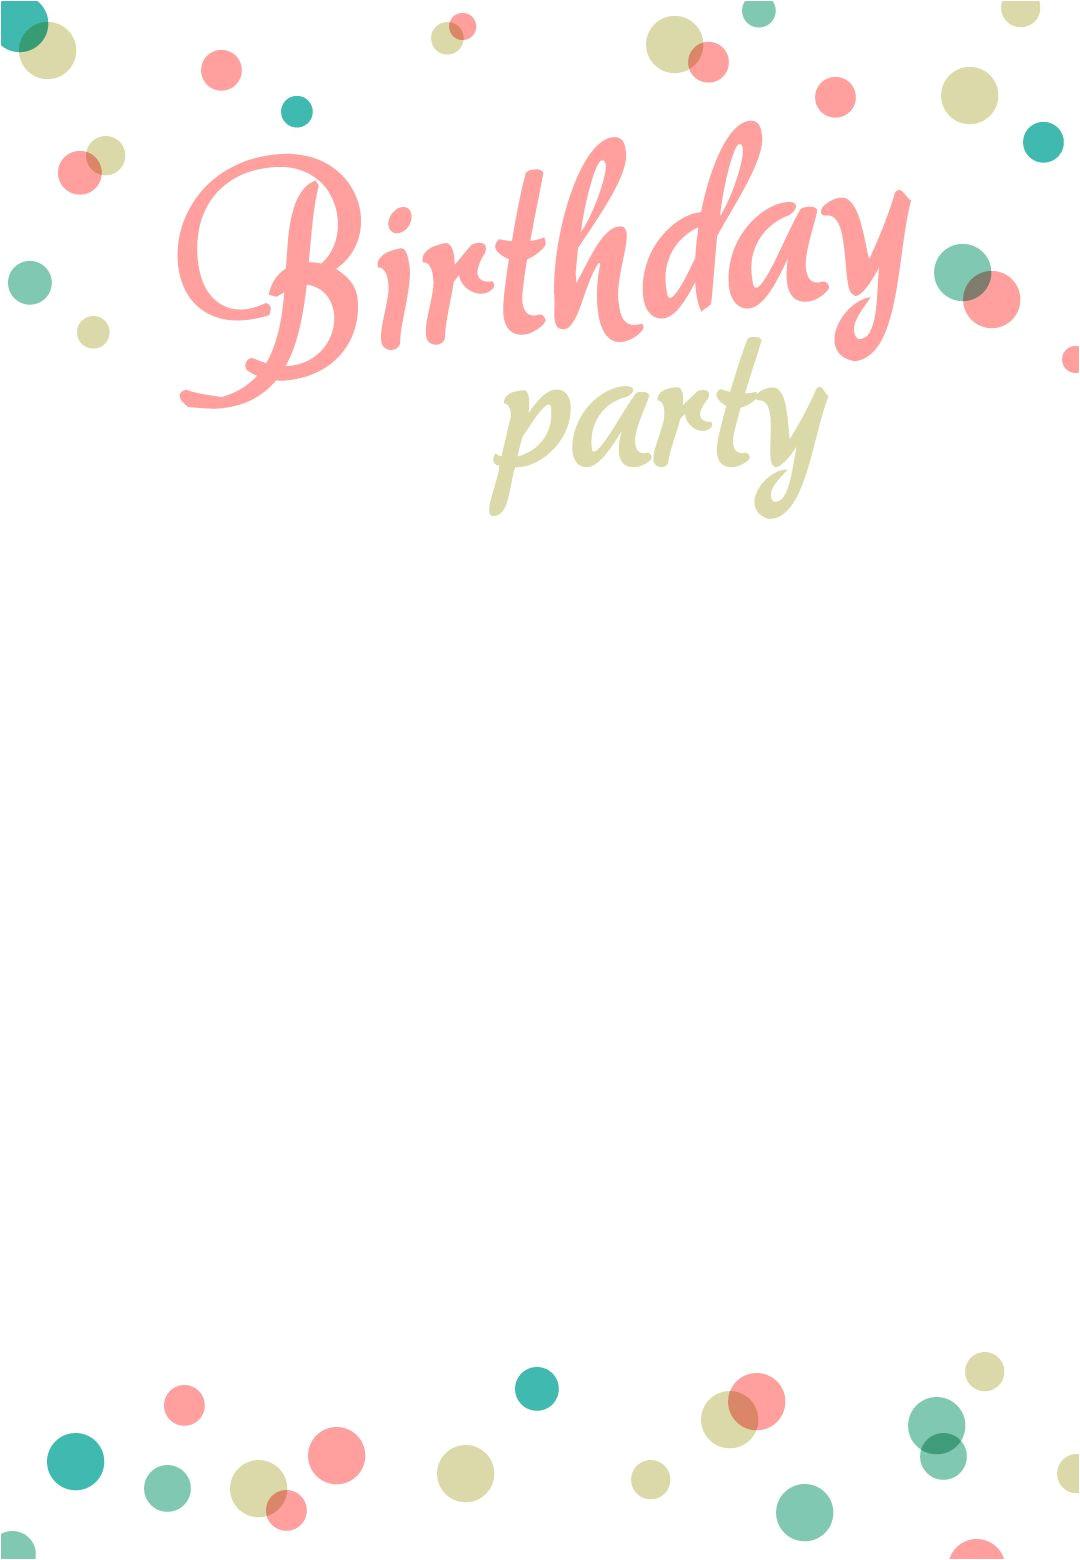 Birthday Party Invitation Template Printable Birthday Party Invitation Free Printable Addison 39 S 1st